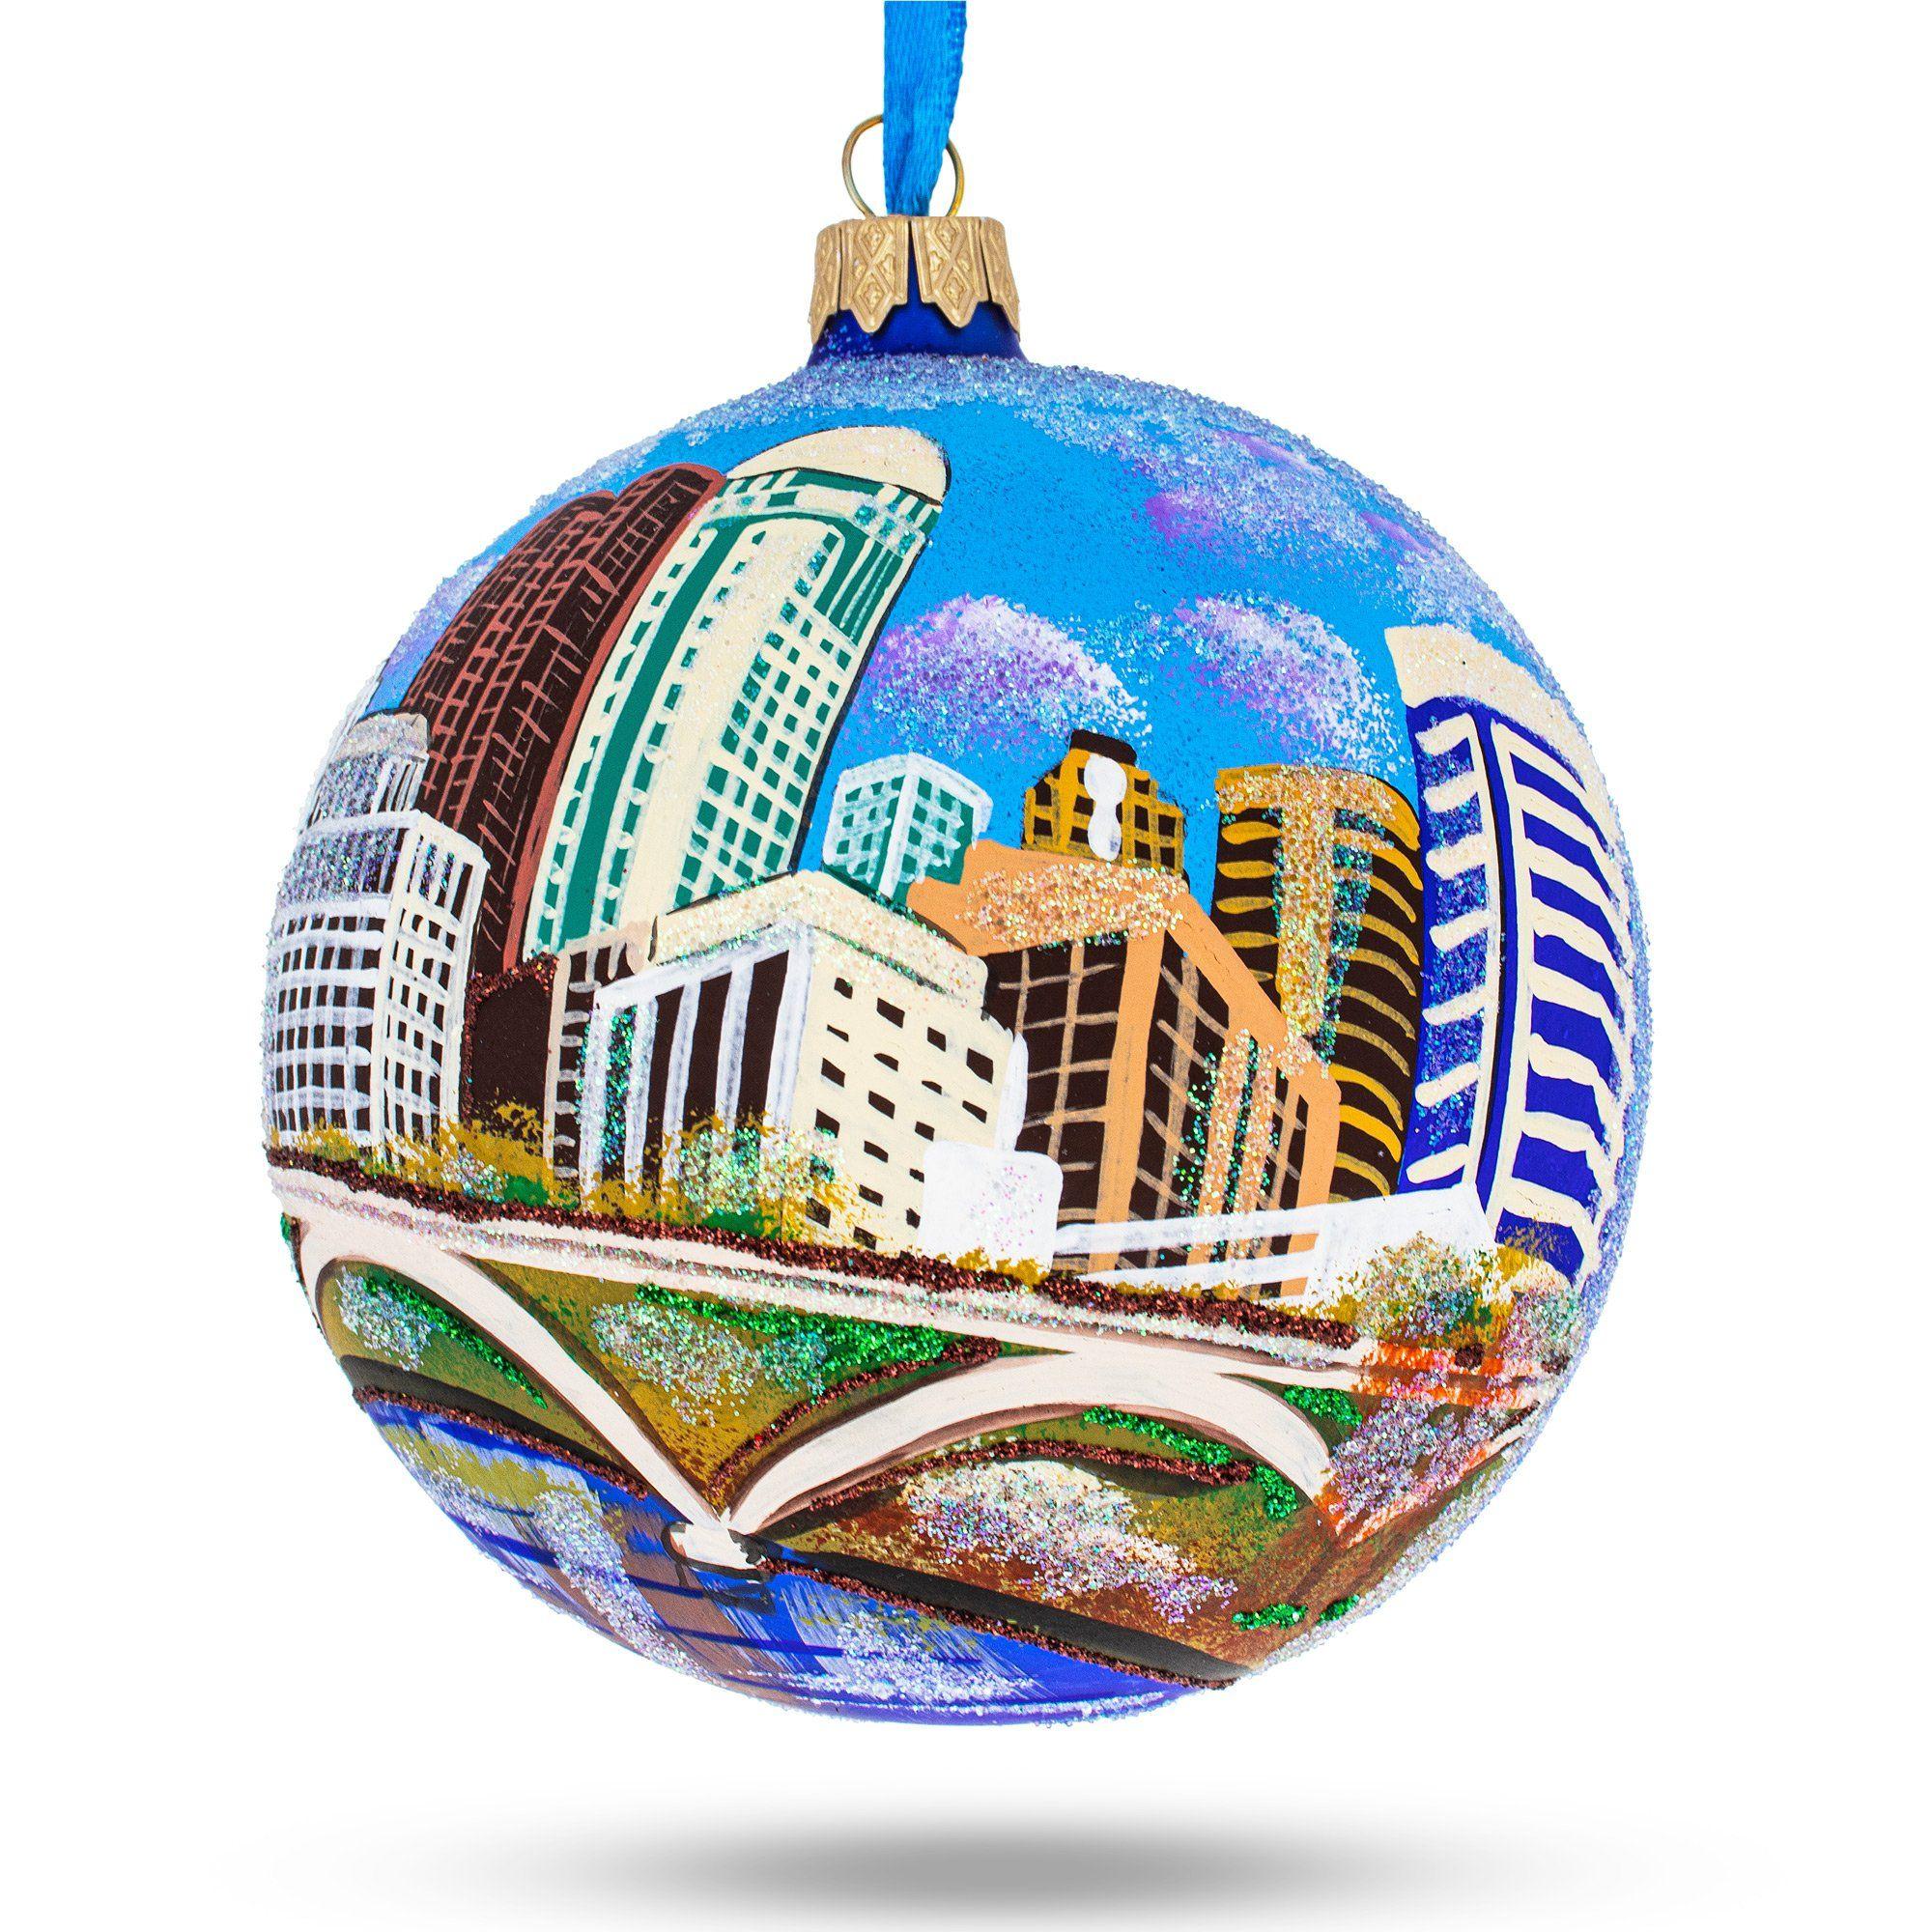 Columbus Ohio Glass Christmas Ornament 4 Inches Glass Christmas Ornaments Christmas Ornaments Personalized Ornaments